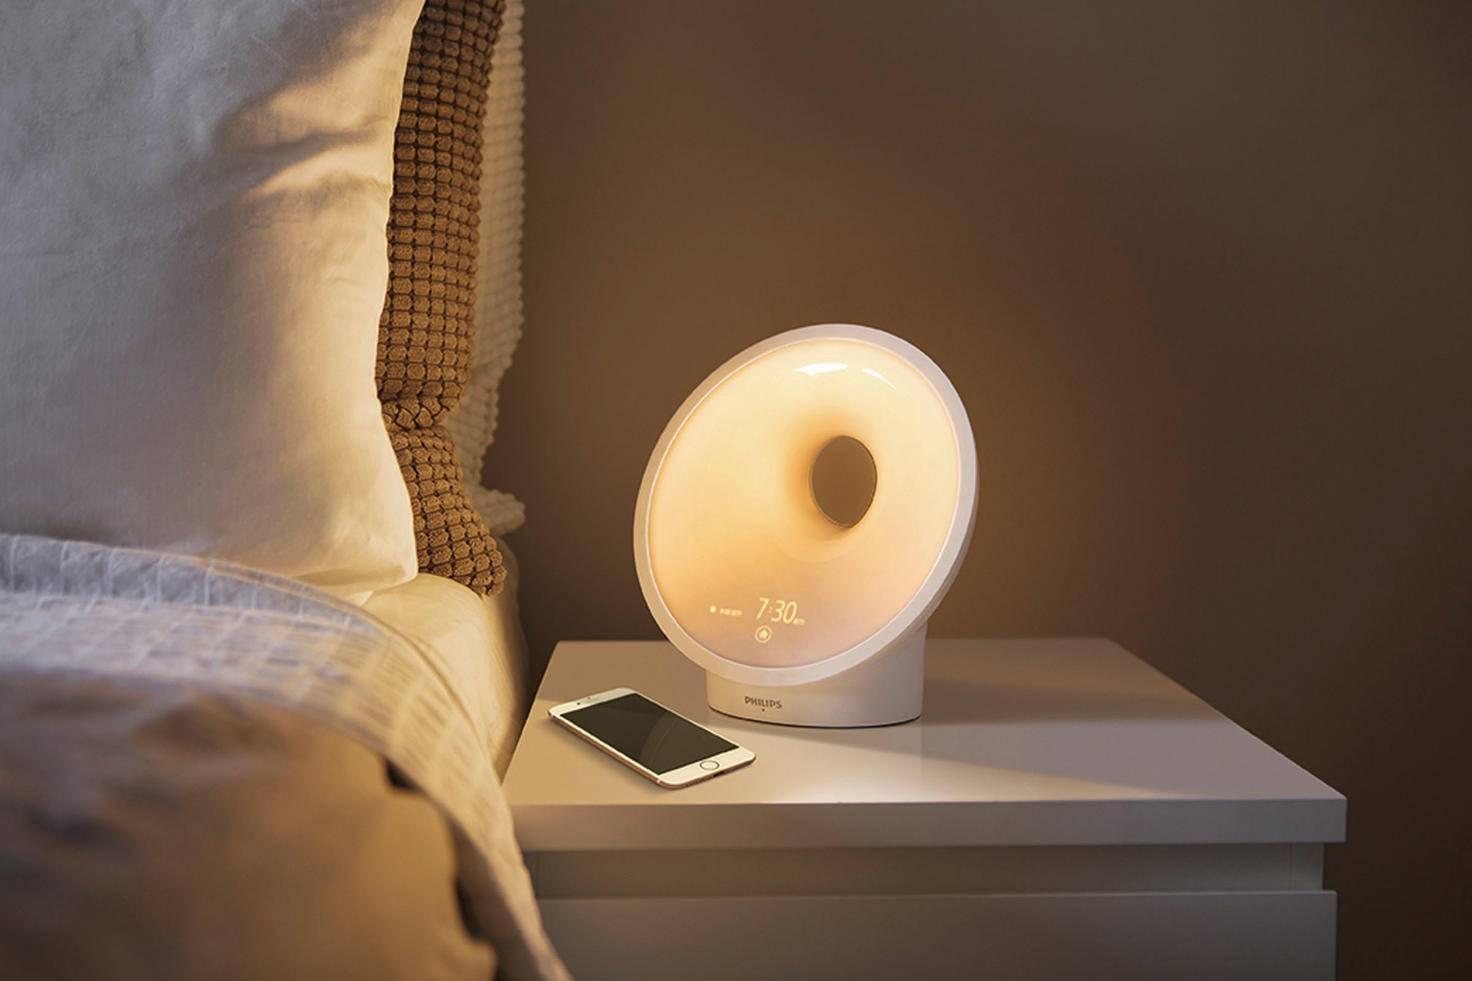 Philips Connected Sleep & Wake Up Light